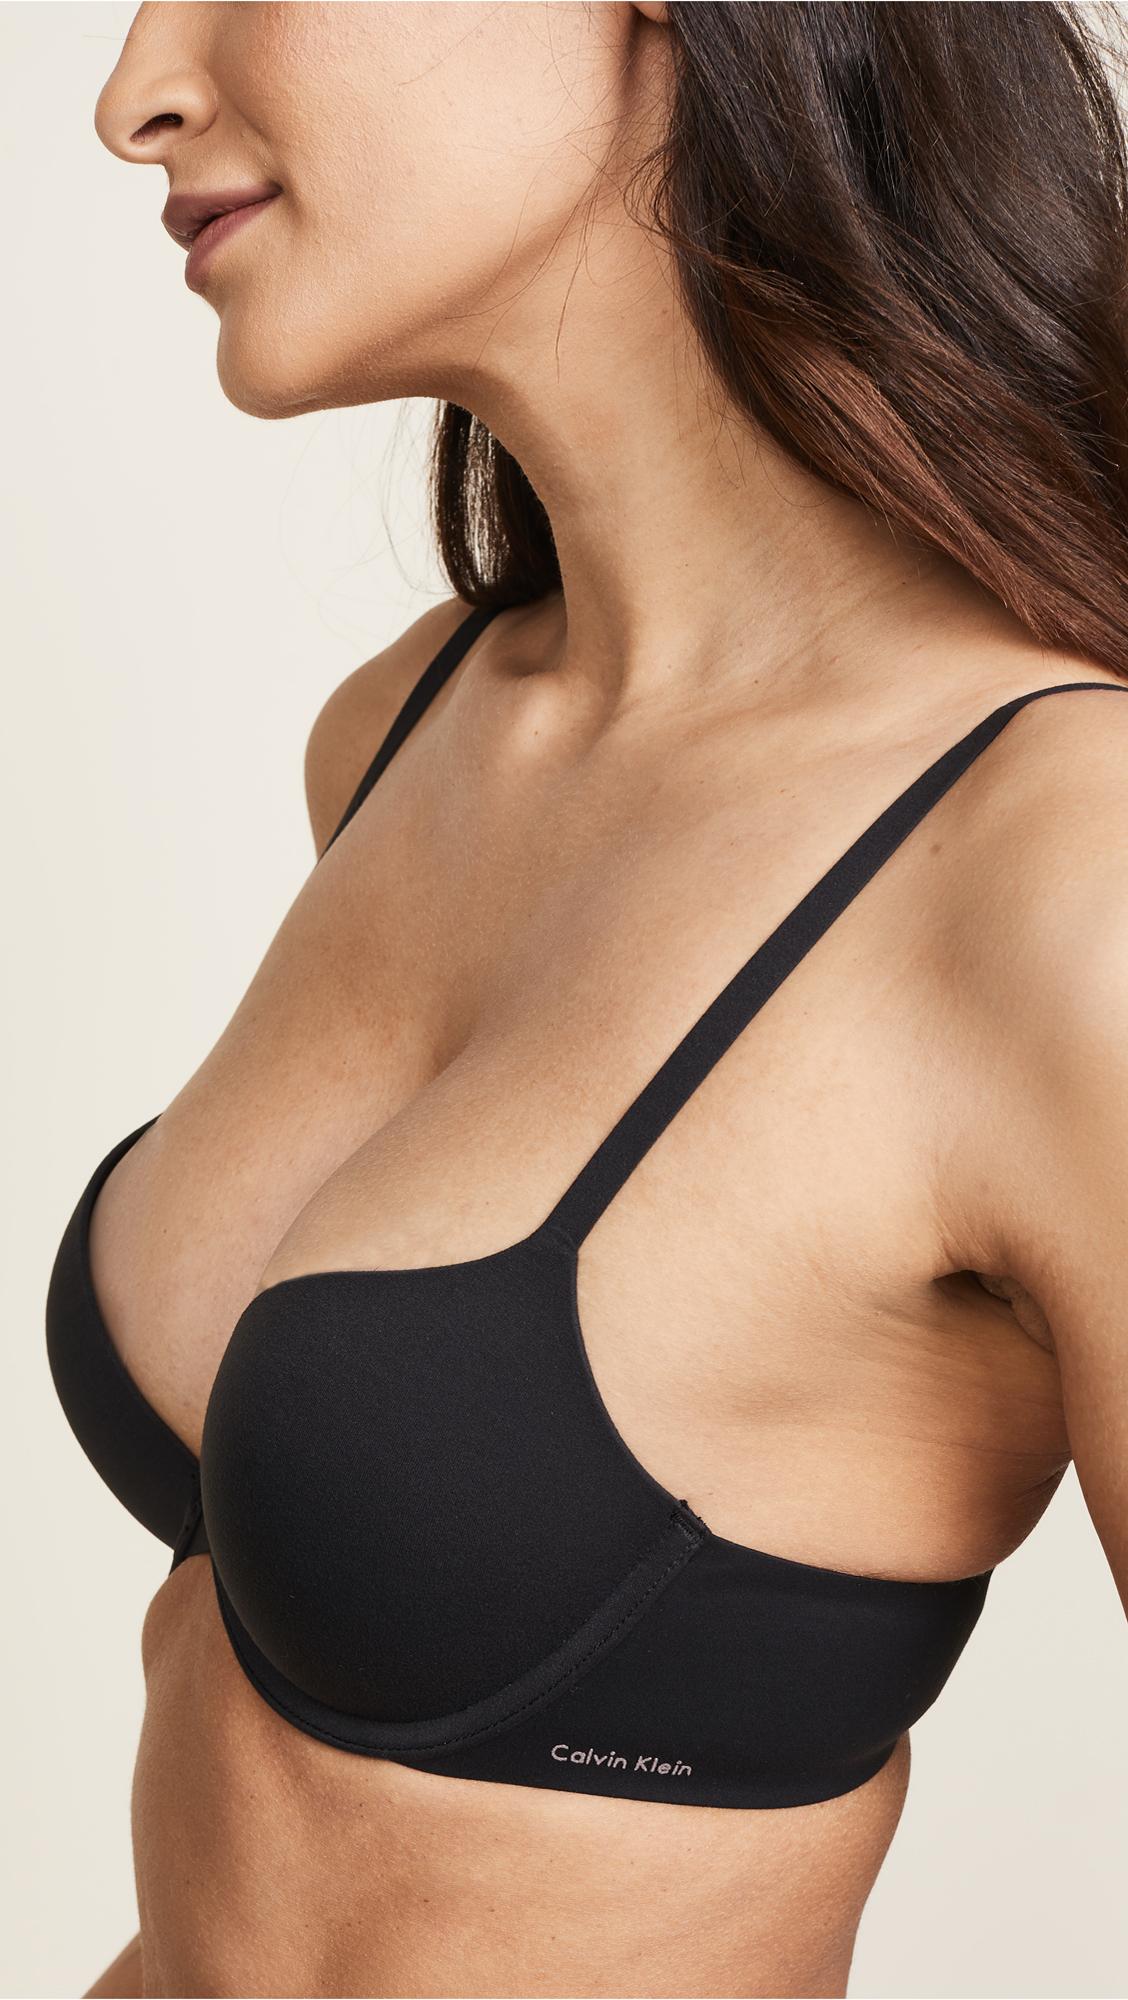 437e2c82b7 Calvin Klein Underwear Perfectly Fit Convertible Push Up Bra